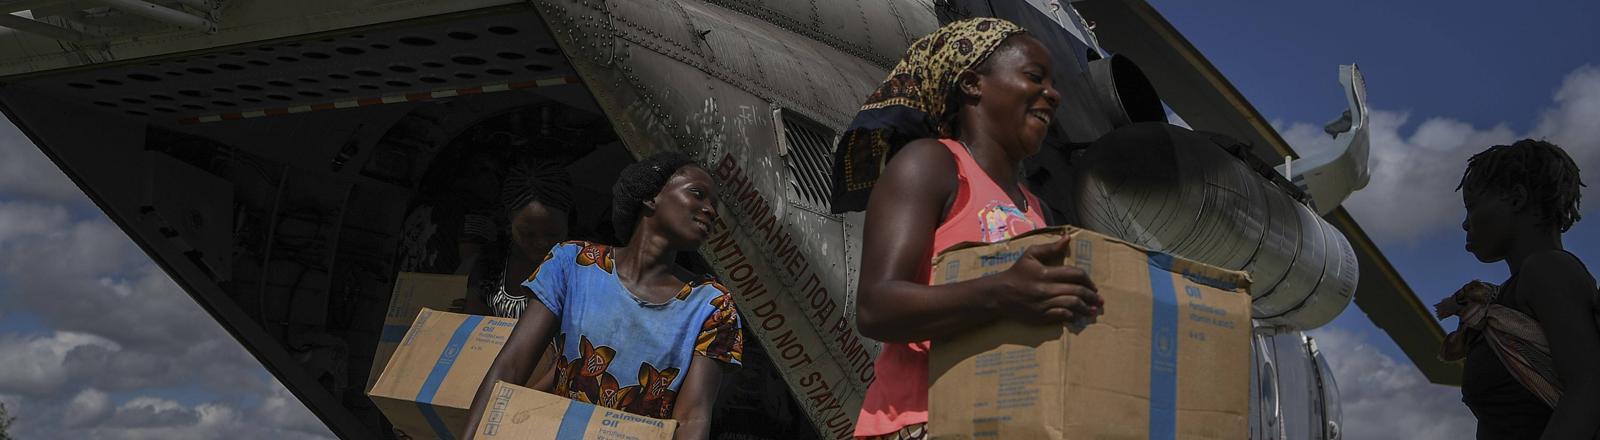 Freiwillige Helferinnen entladen in Bebedo, Mosambik einen Helikopter mit Nahrungsmitteln